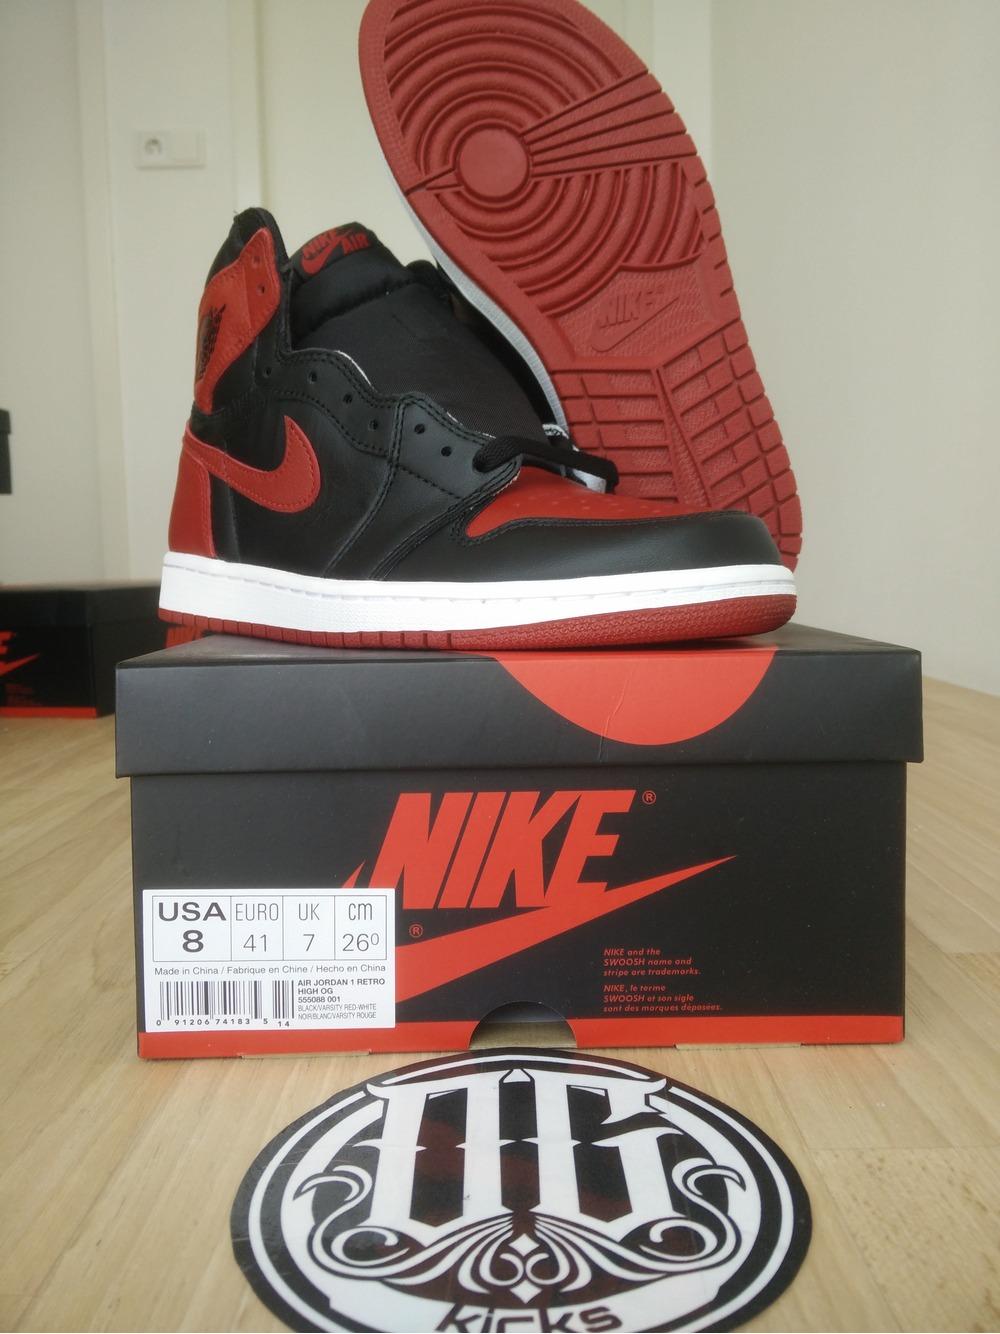 e510532f4ce Nike Air Jordan 1 Retro High Banned Bred 2013 DS SIZE 10.5 US OG Red Black Air  Jordan 1 Banned 2016 size US 8 EU 41 - photo 29 ...